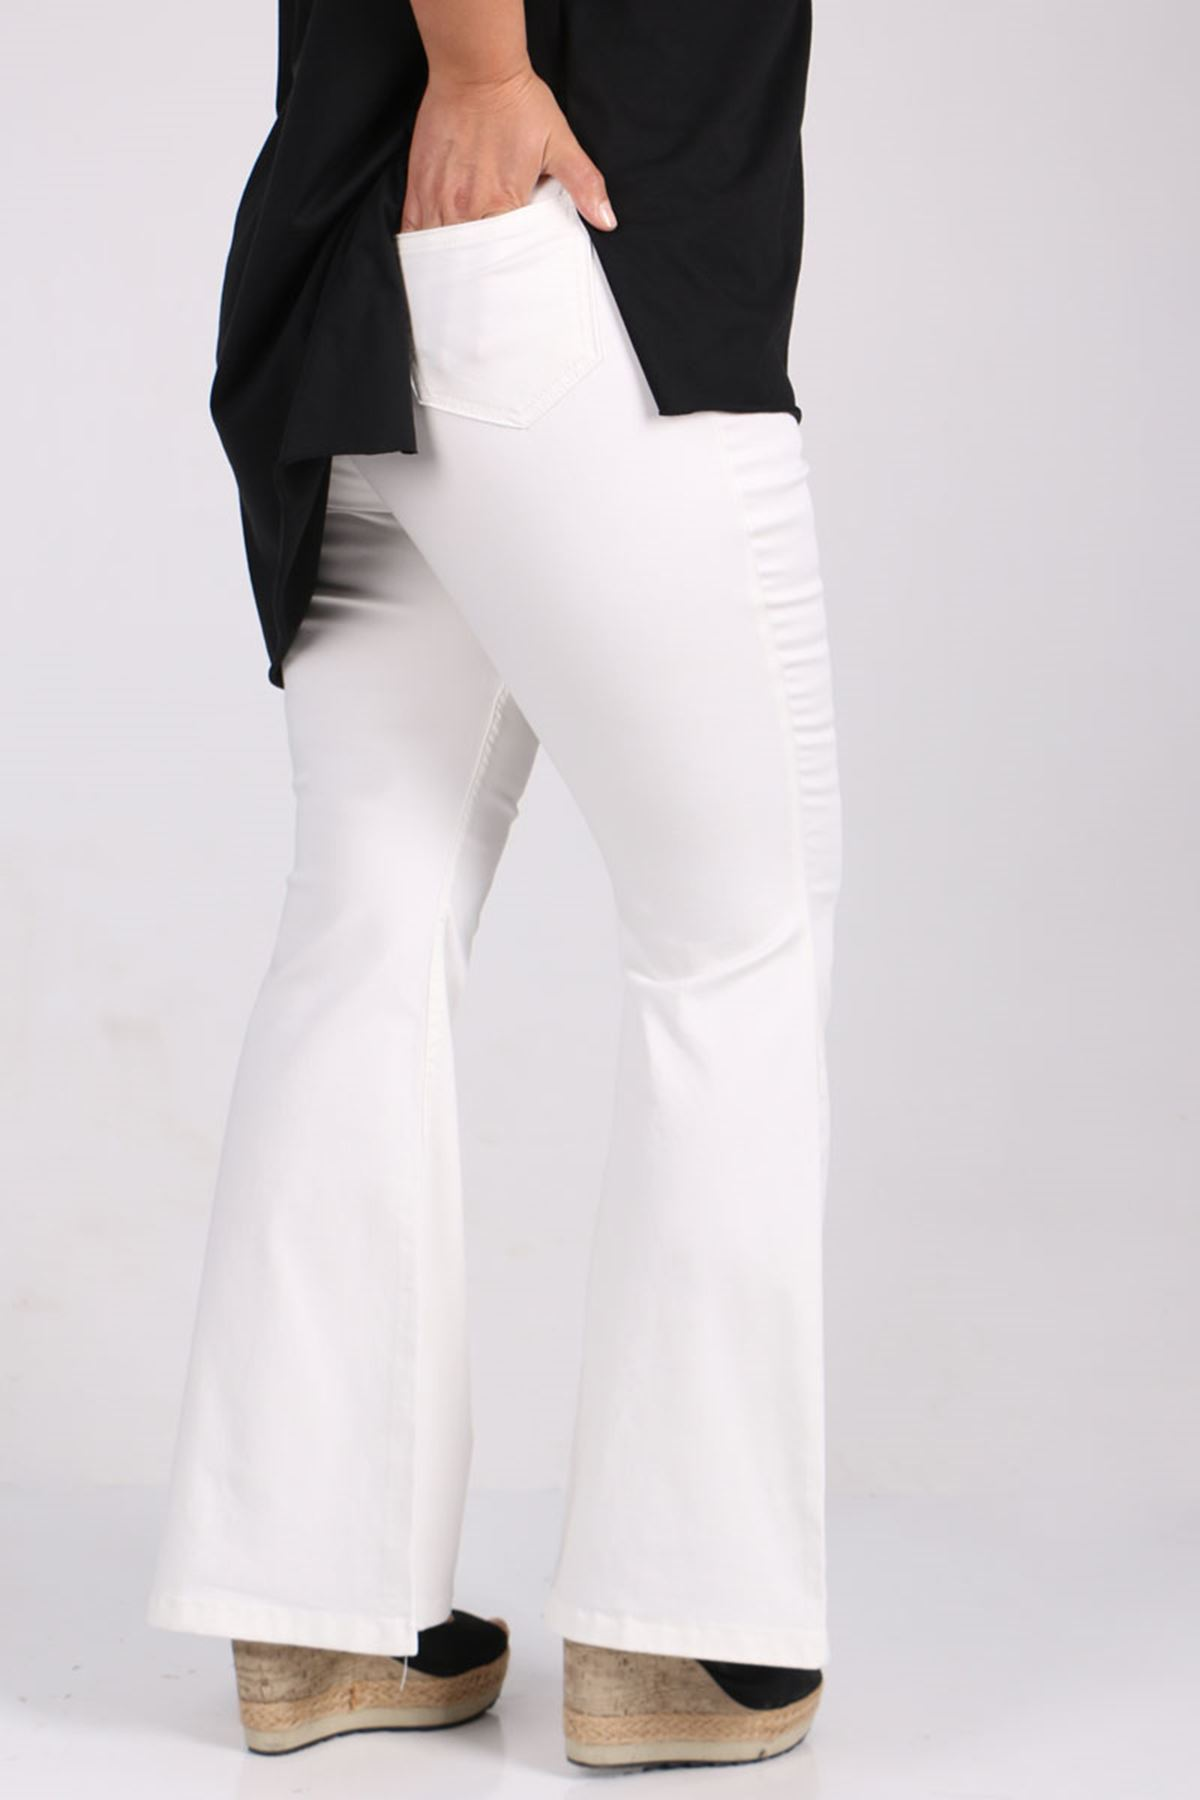 9137-1 Büyük Beden Beli Lastikli İspanyol Paça Kot Pantalon-Beyaz